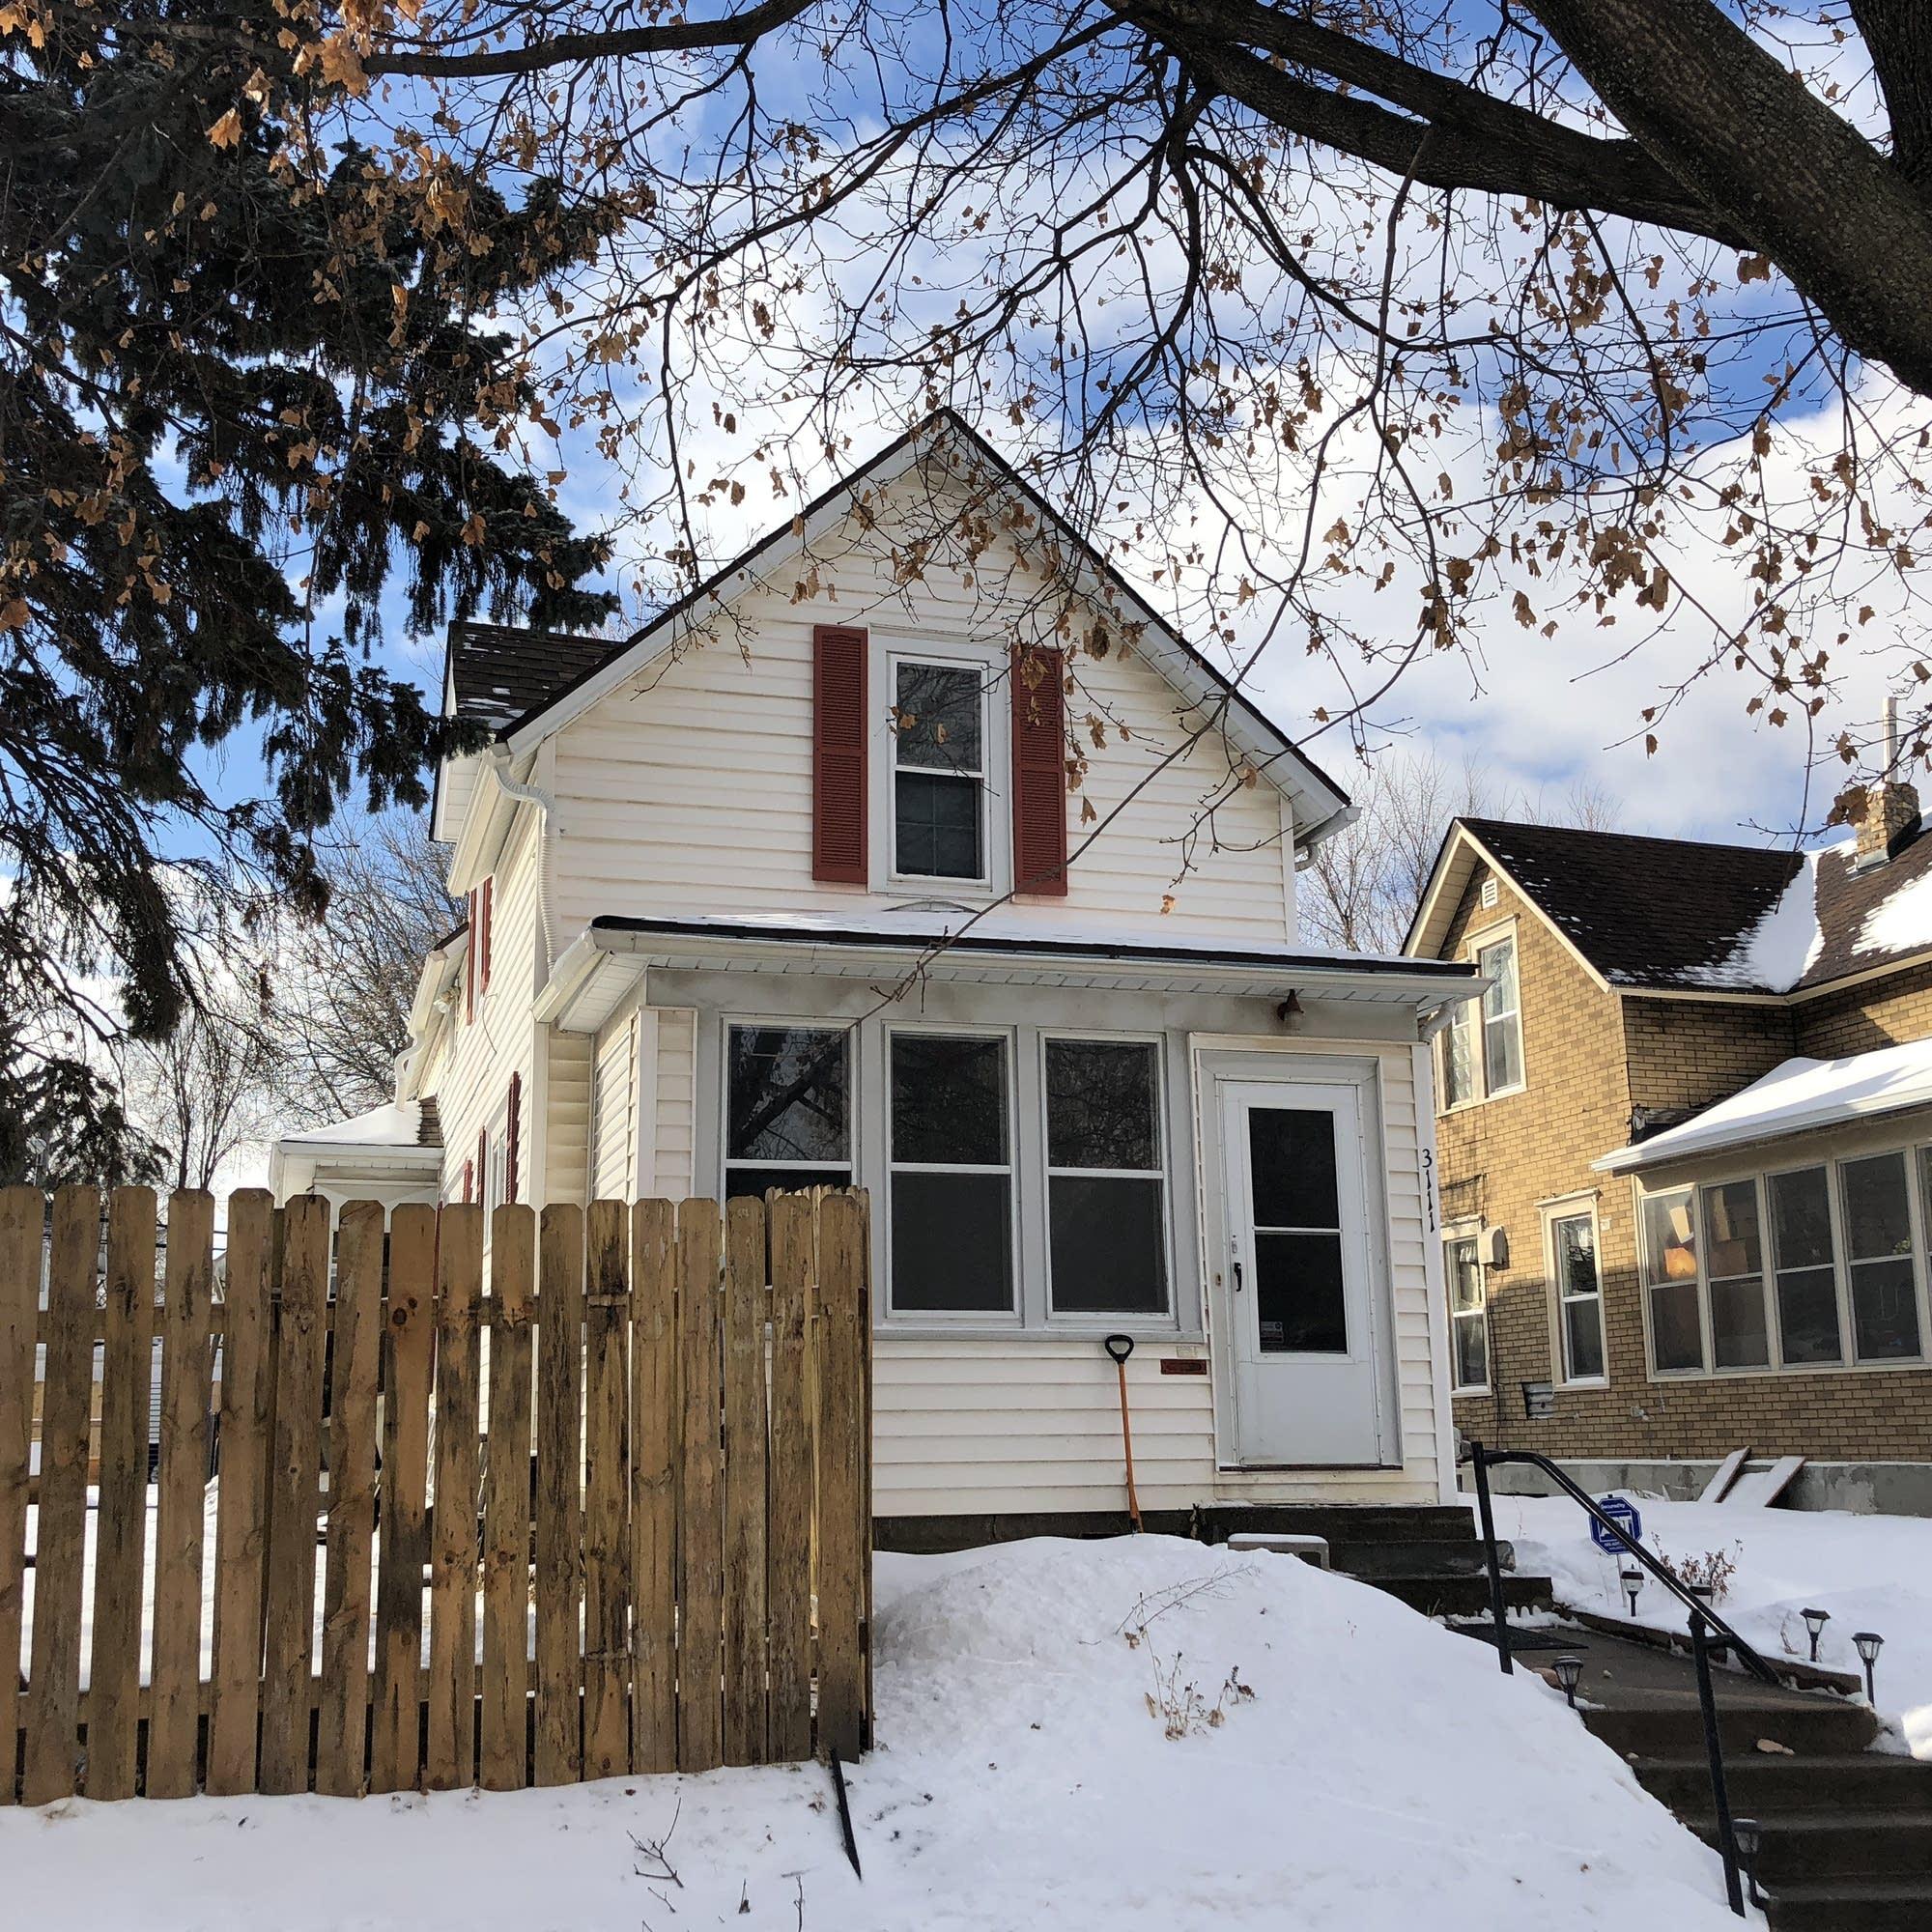 Landlord battles haunt Twin Cities low-income renters | MPR News